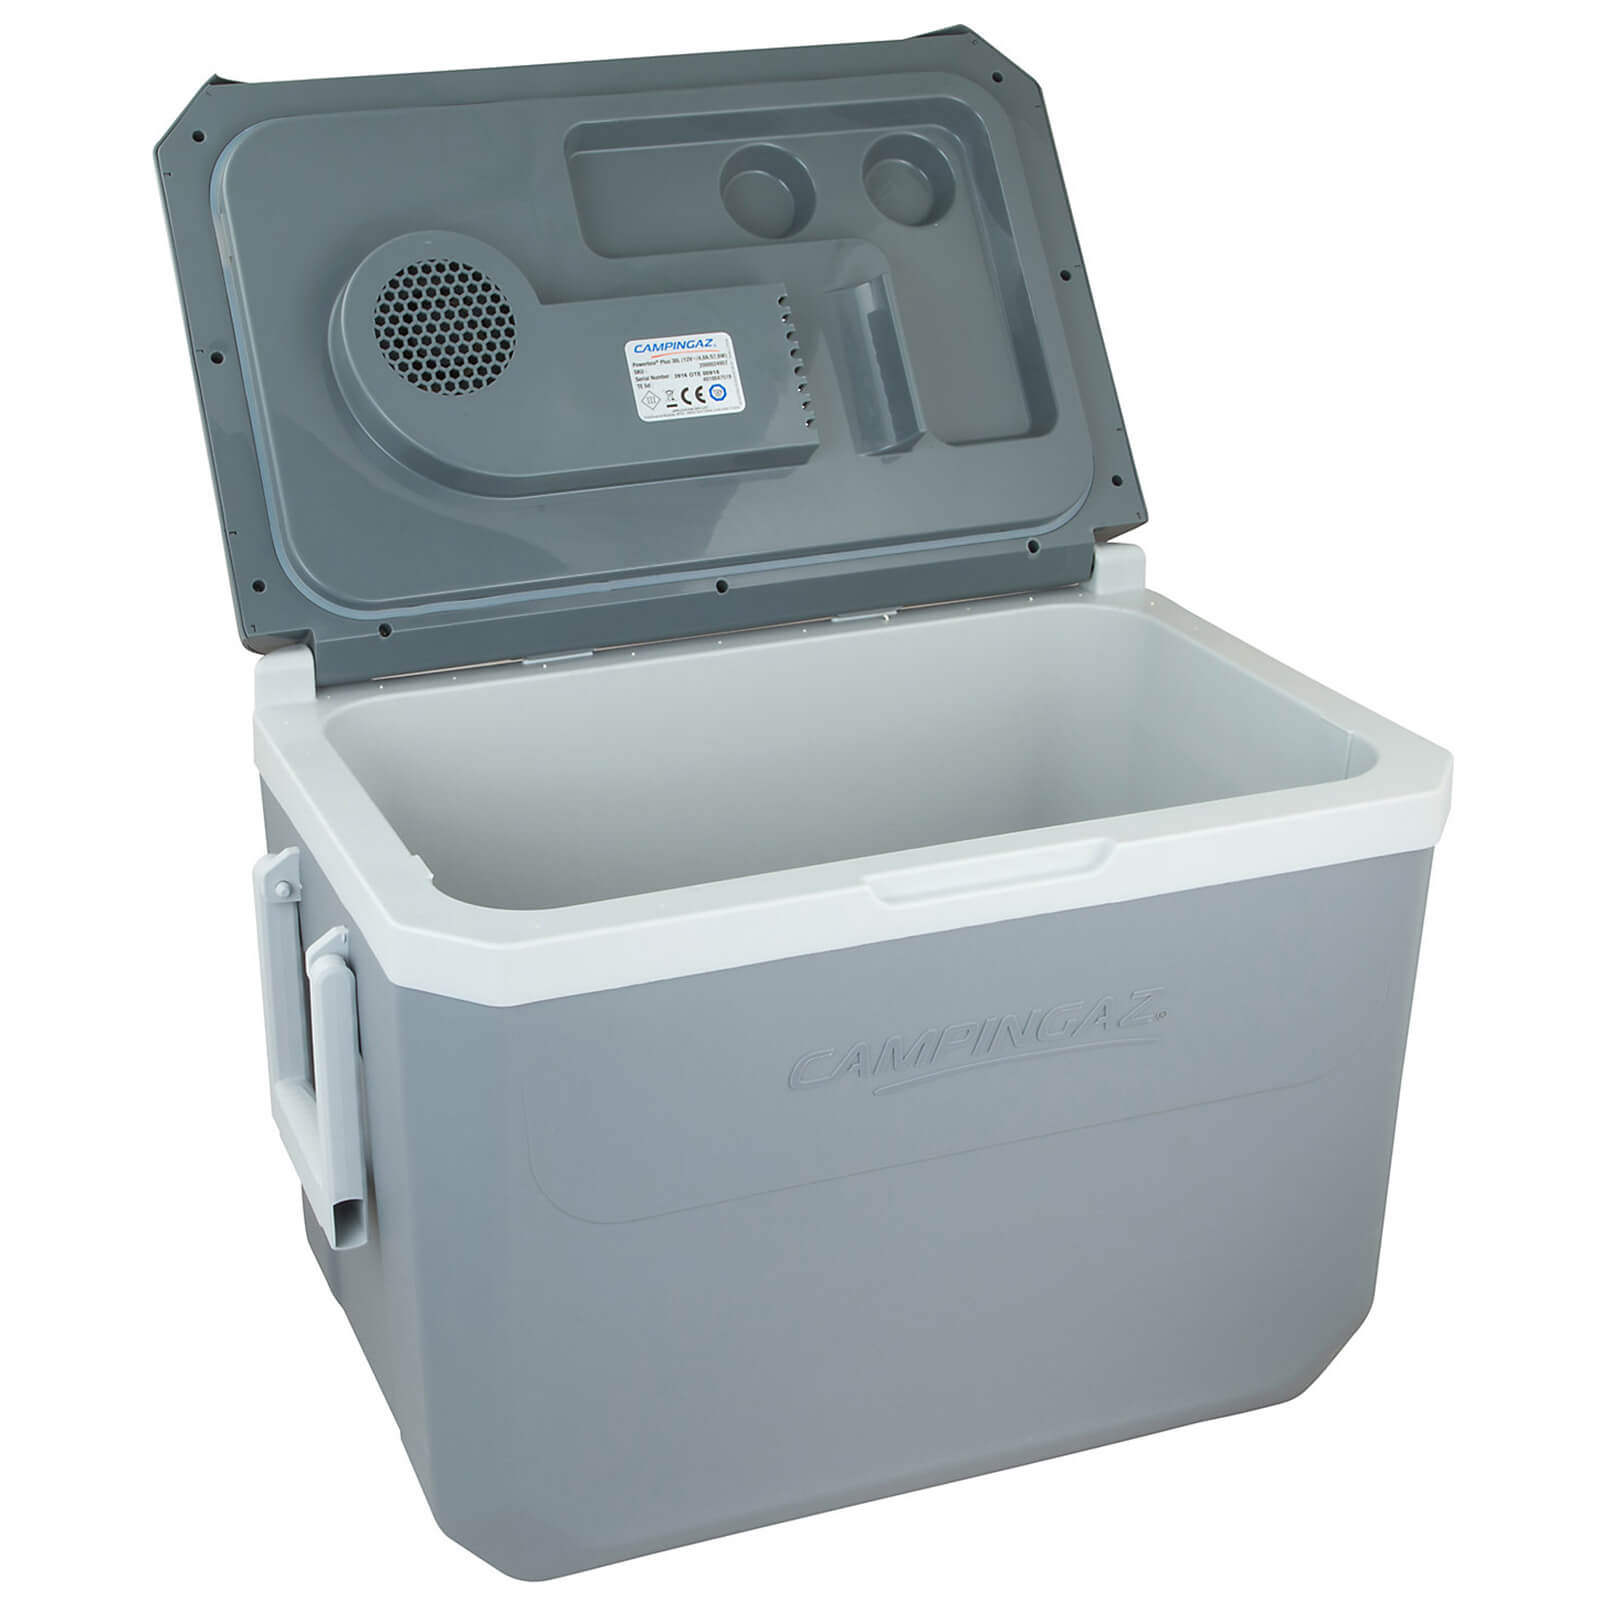 Campingaz Powerbox Plus Cooler - 12/230V 36L Homeware | Zavvi